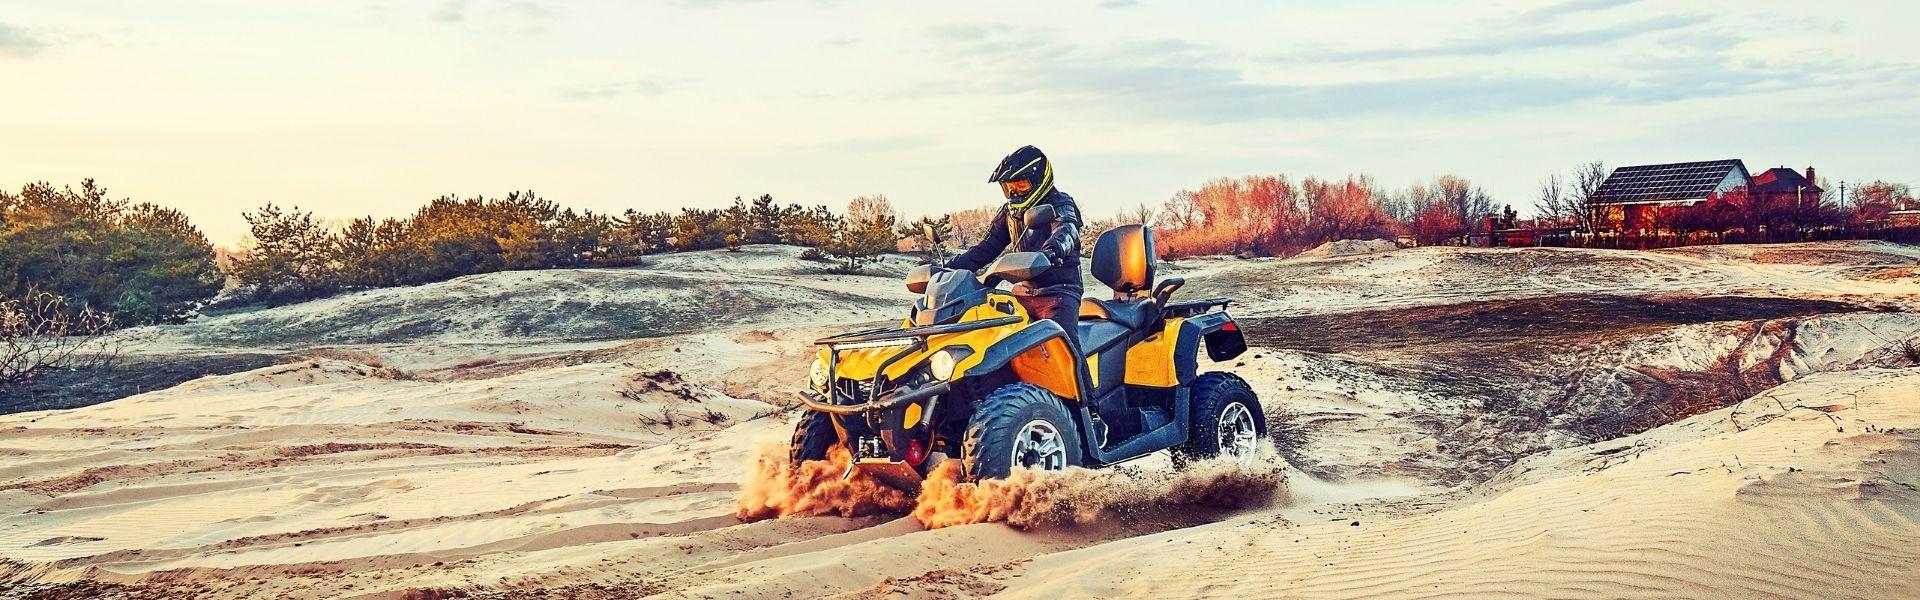 ATV Rental in Kherson